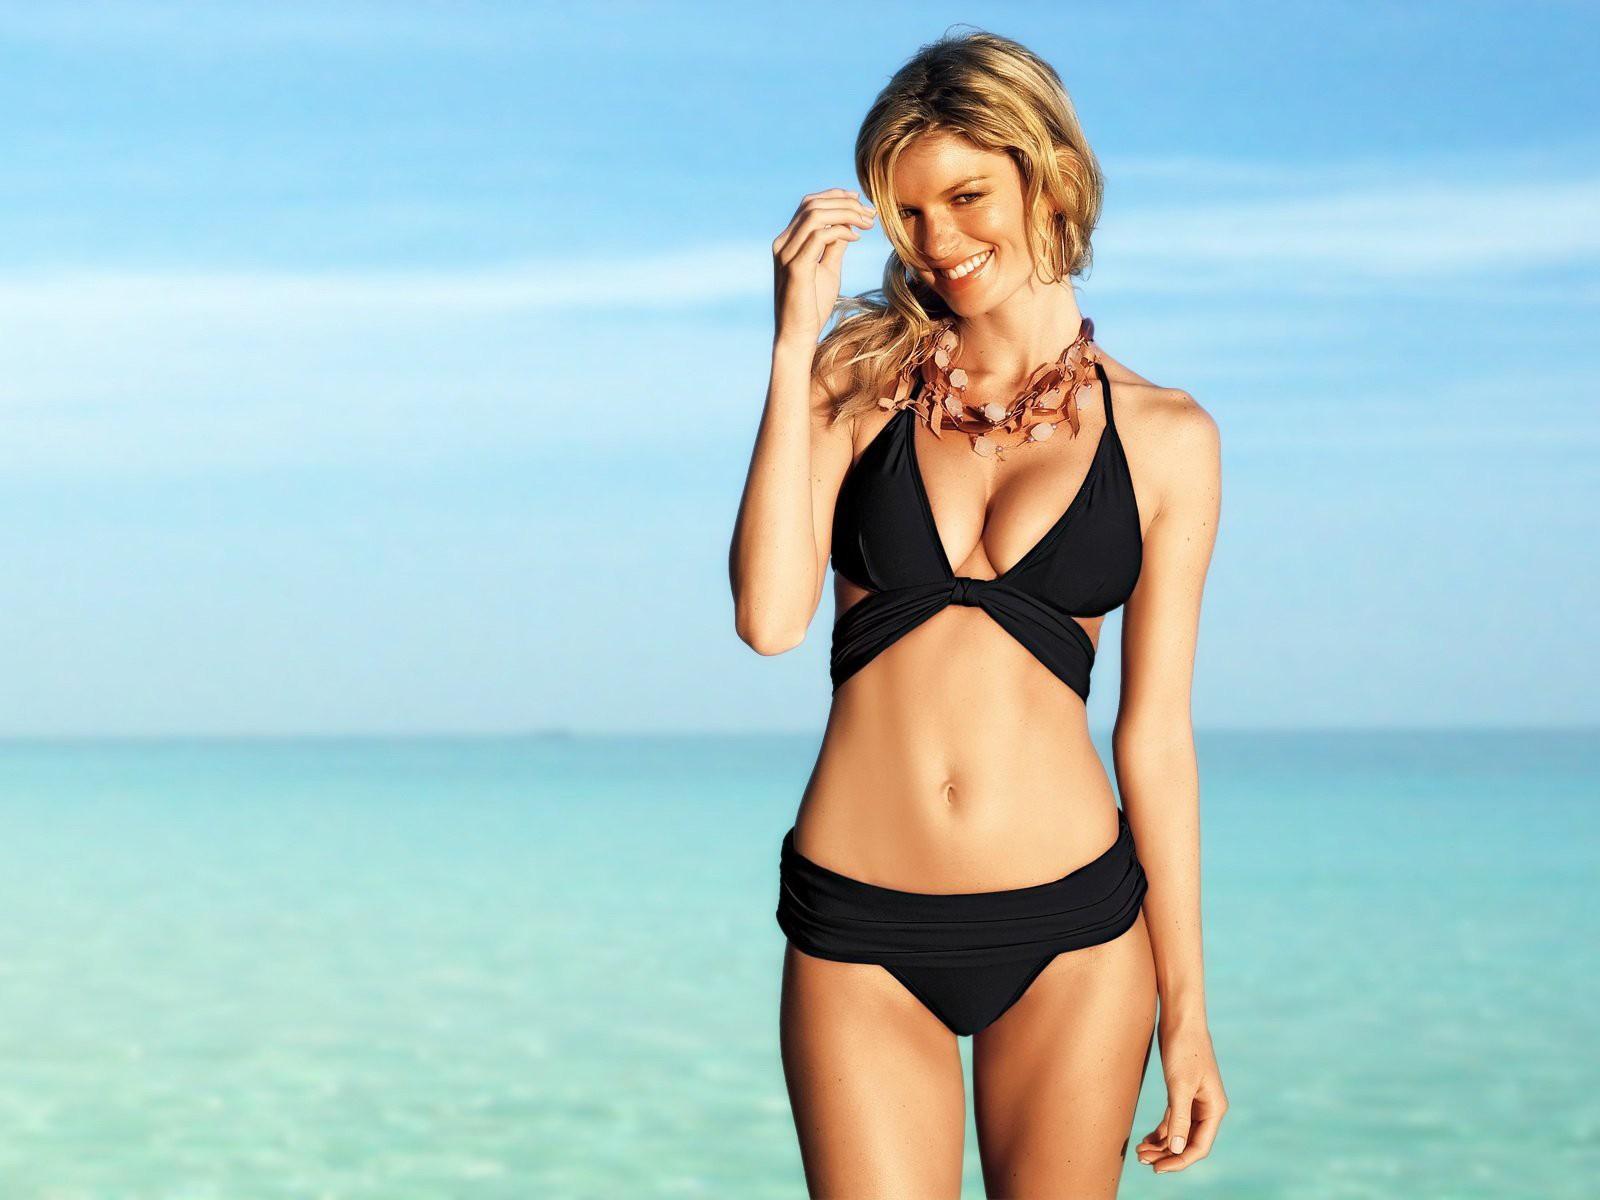 ASOS Online Shopping for the Latest Clothes Fashion 9 11 satellite photos